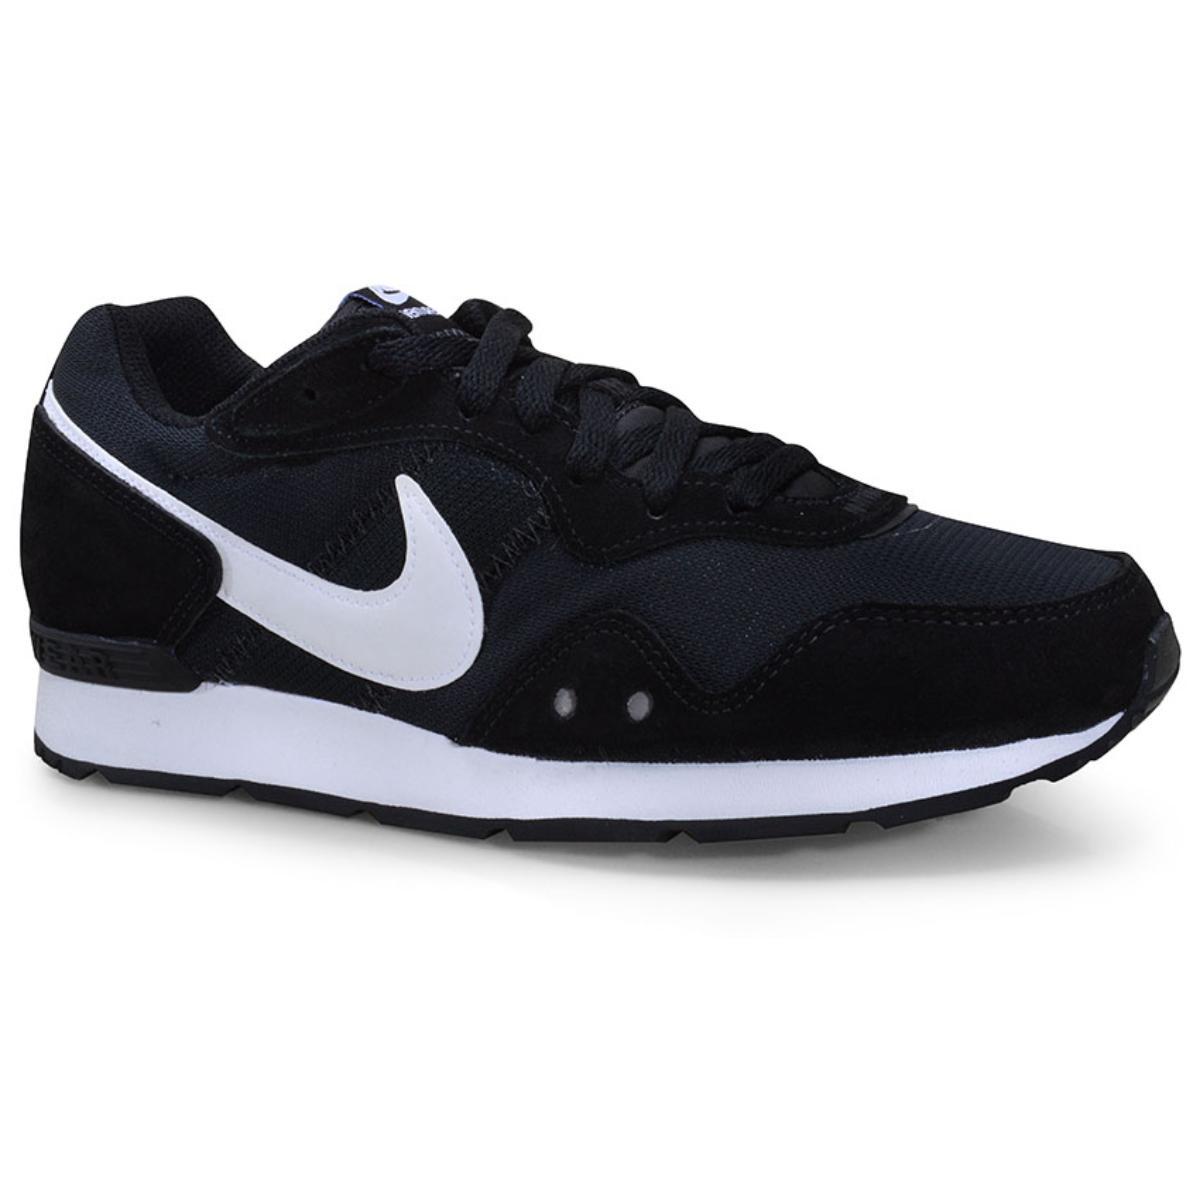 Tênis Masculino Nike Ck2944-002 Venture Runner Preto/branco